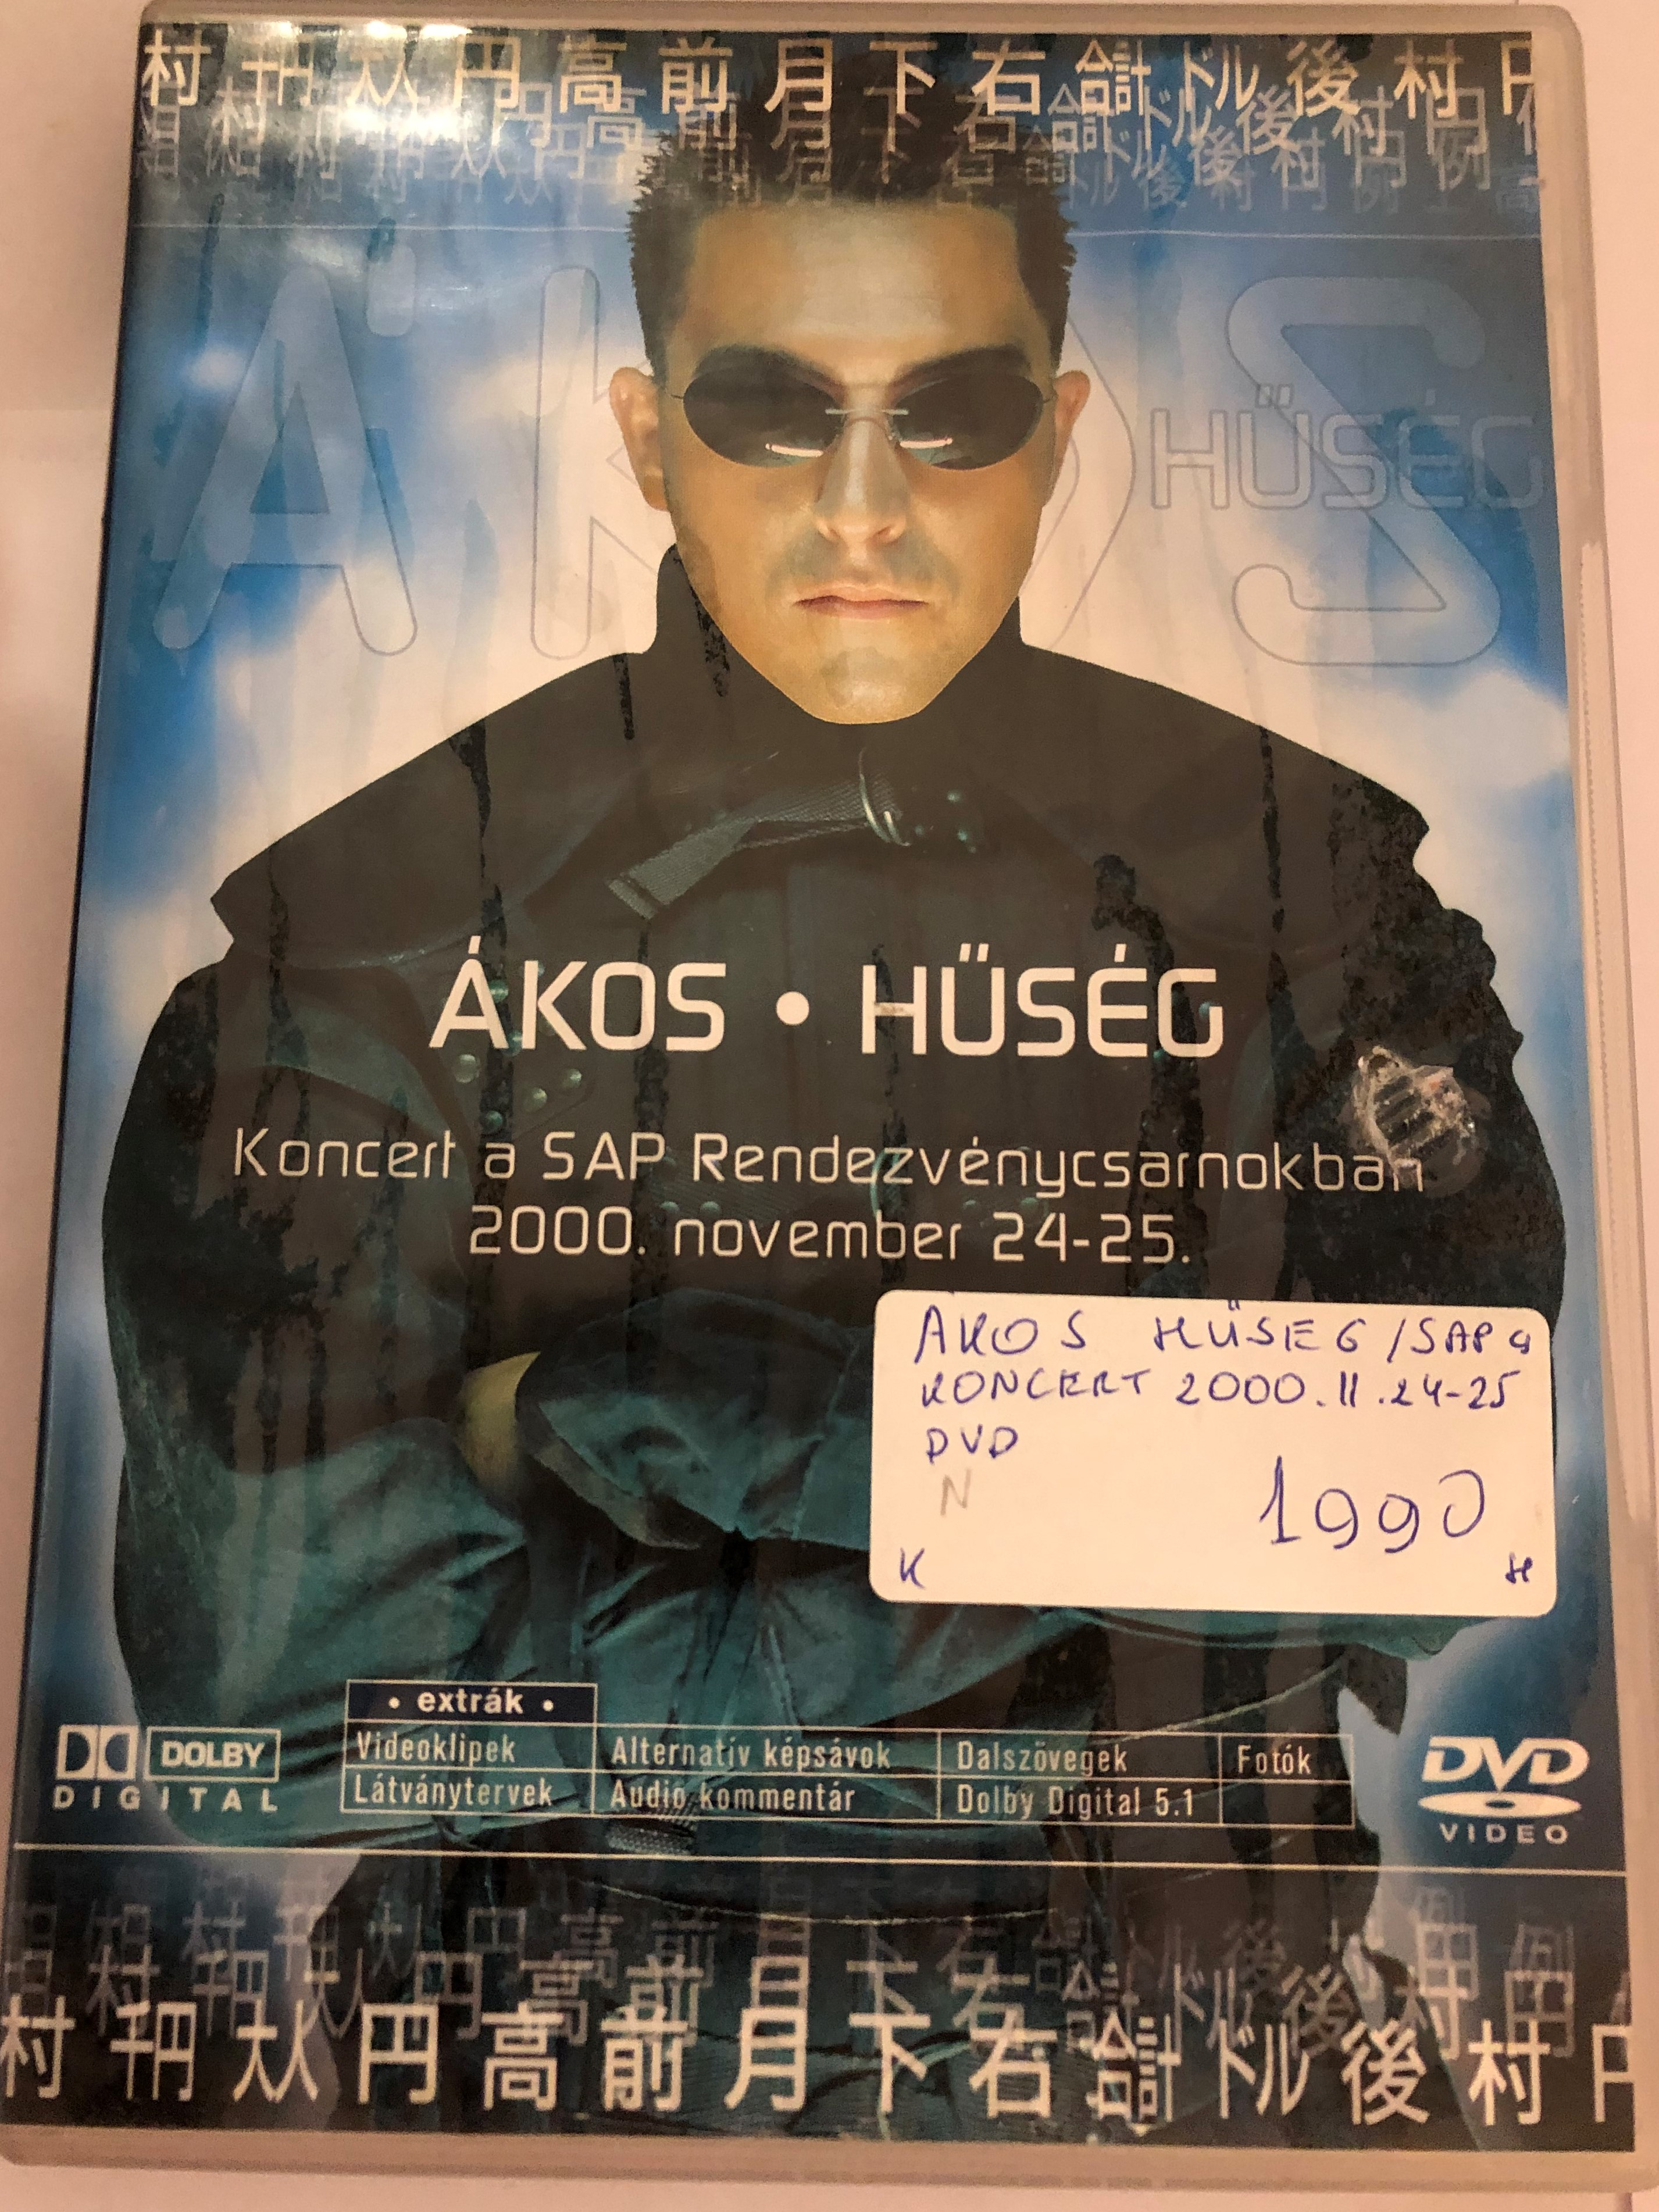 -kos-h-s-g-dvd-2001-koncert-a-sap-rendezv-nycsarnokban-2000.-november-24-25.-1.jpg